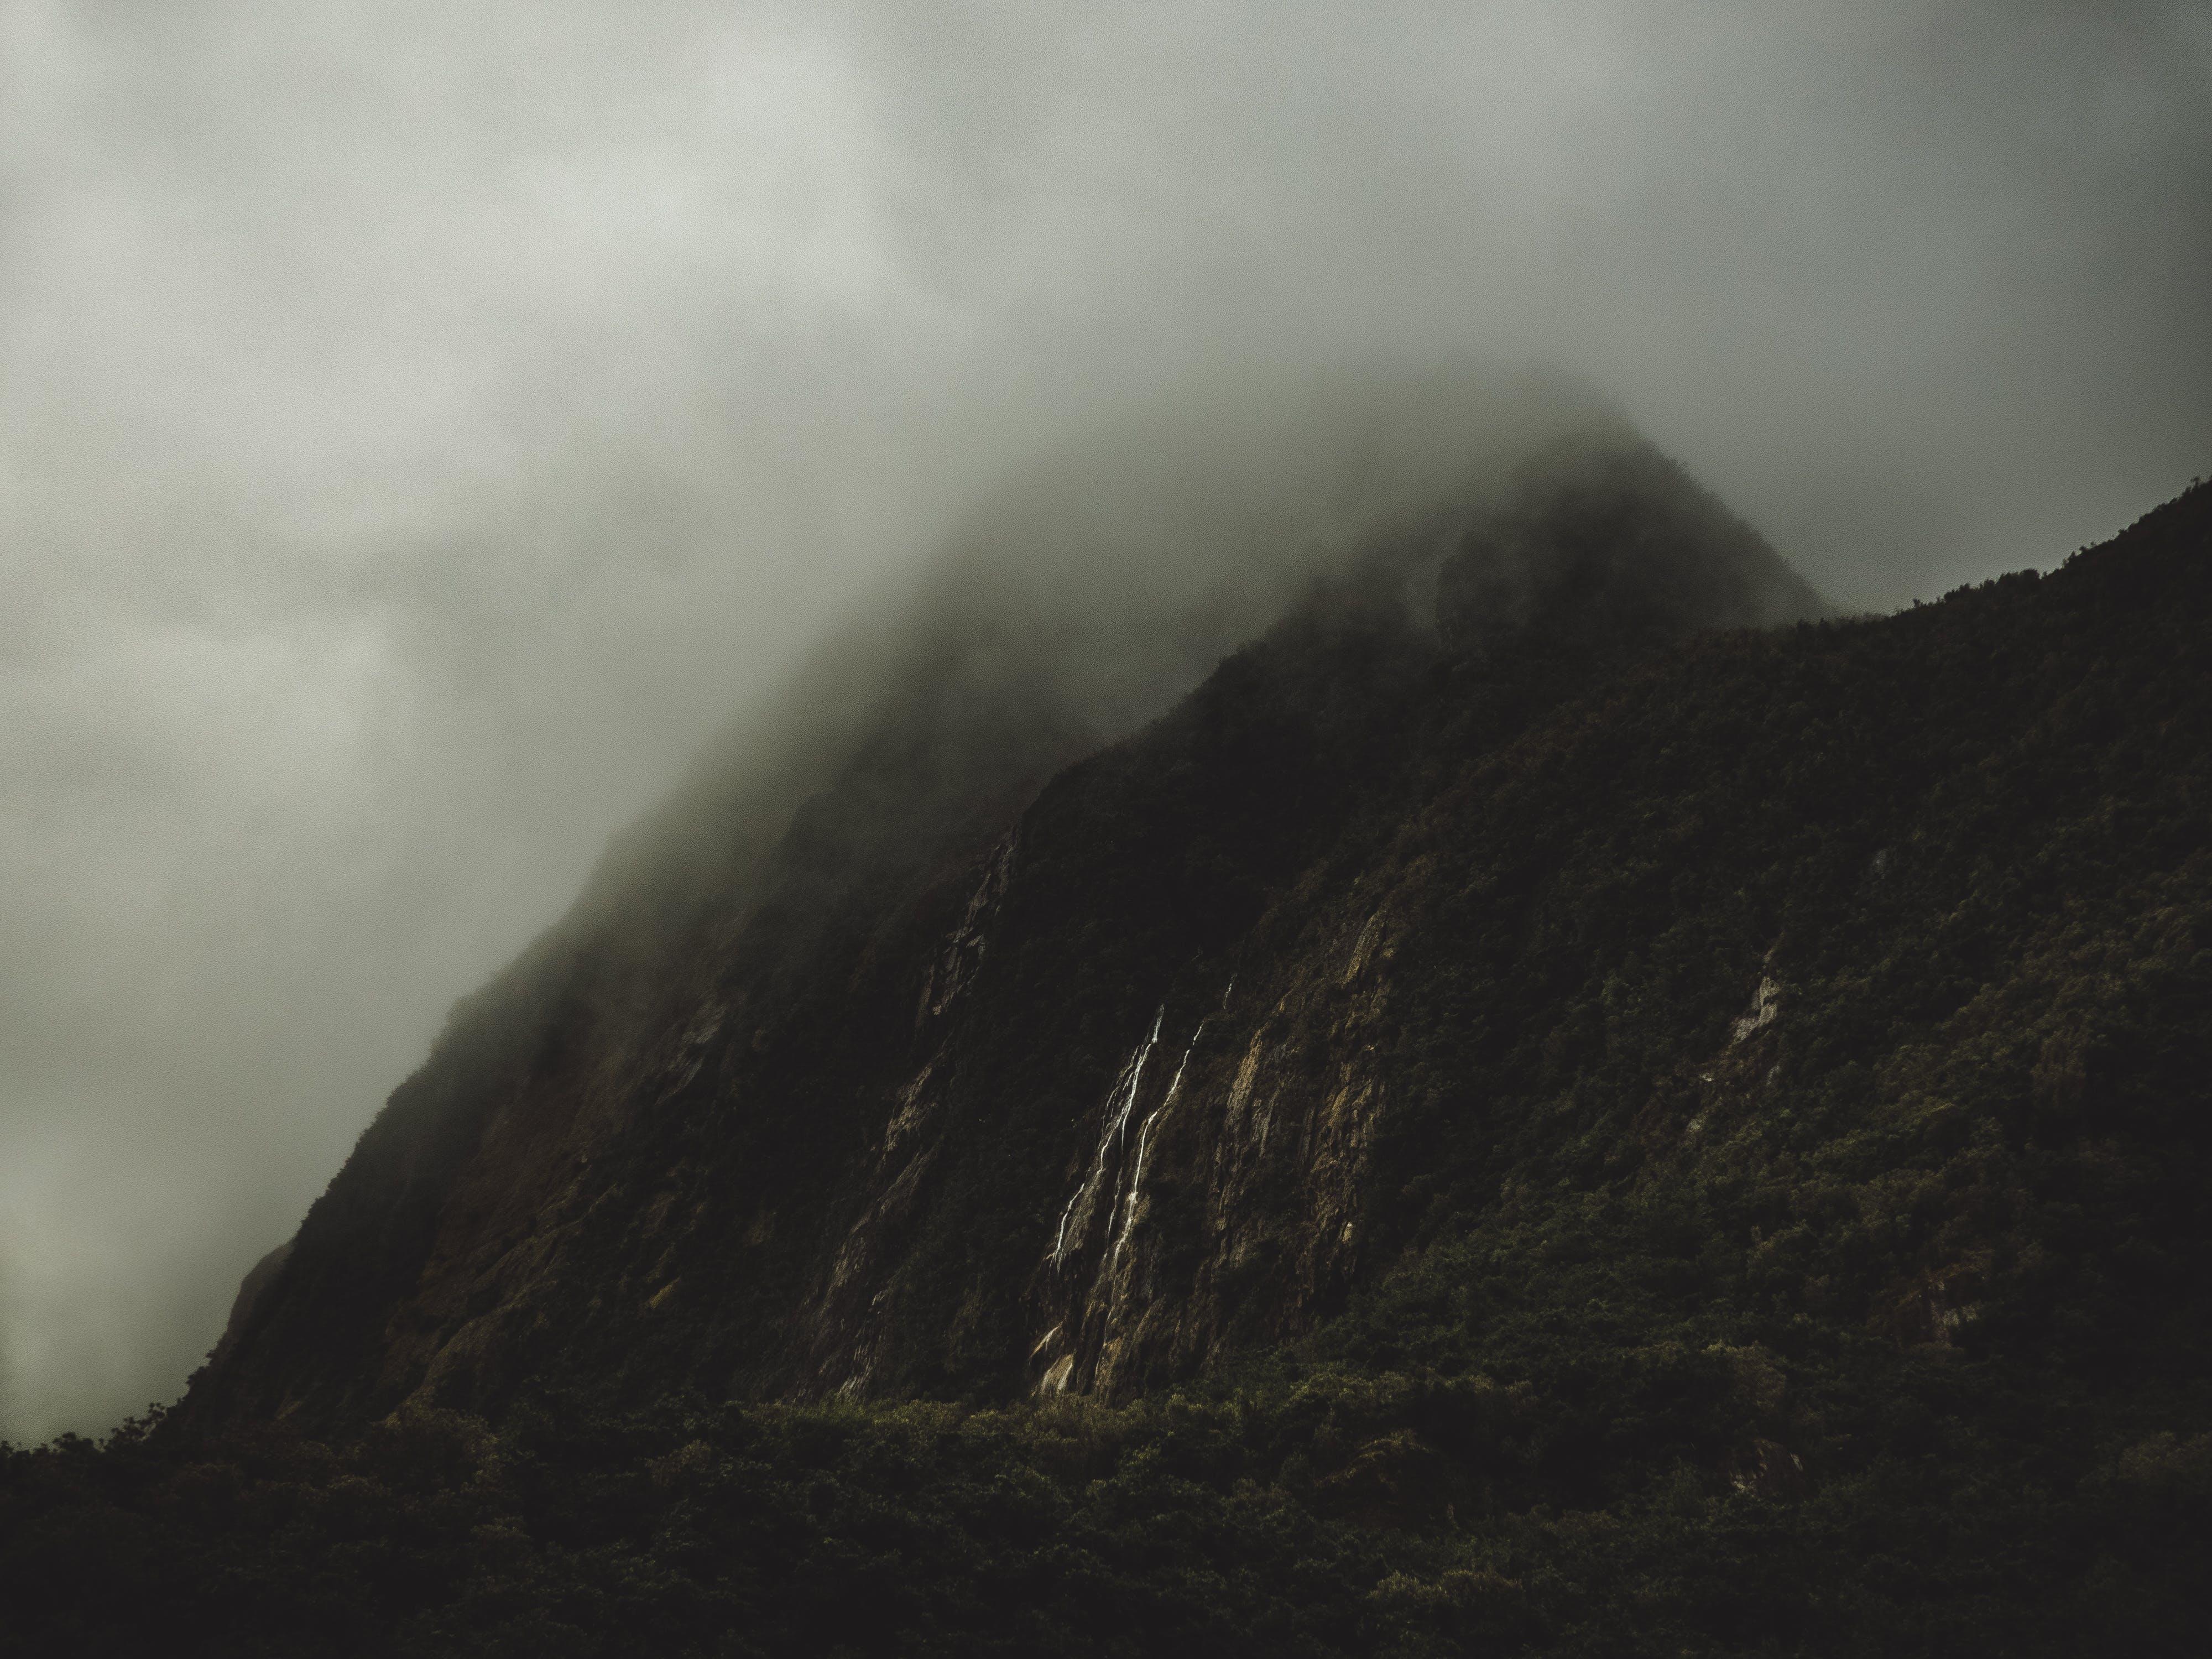 cliff, foggy, gloomy